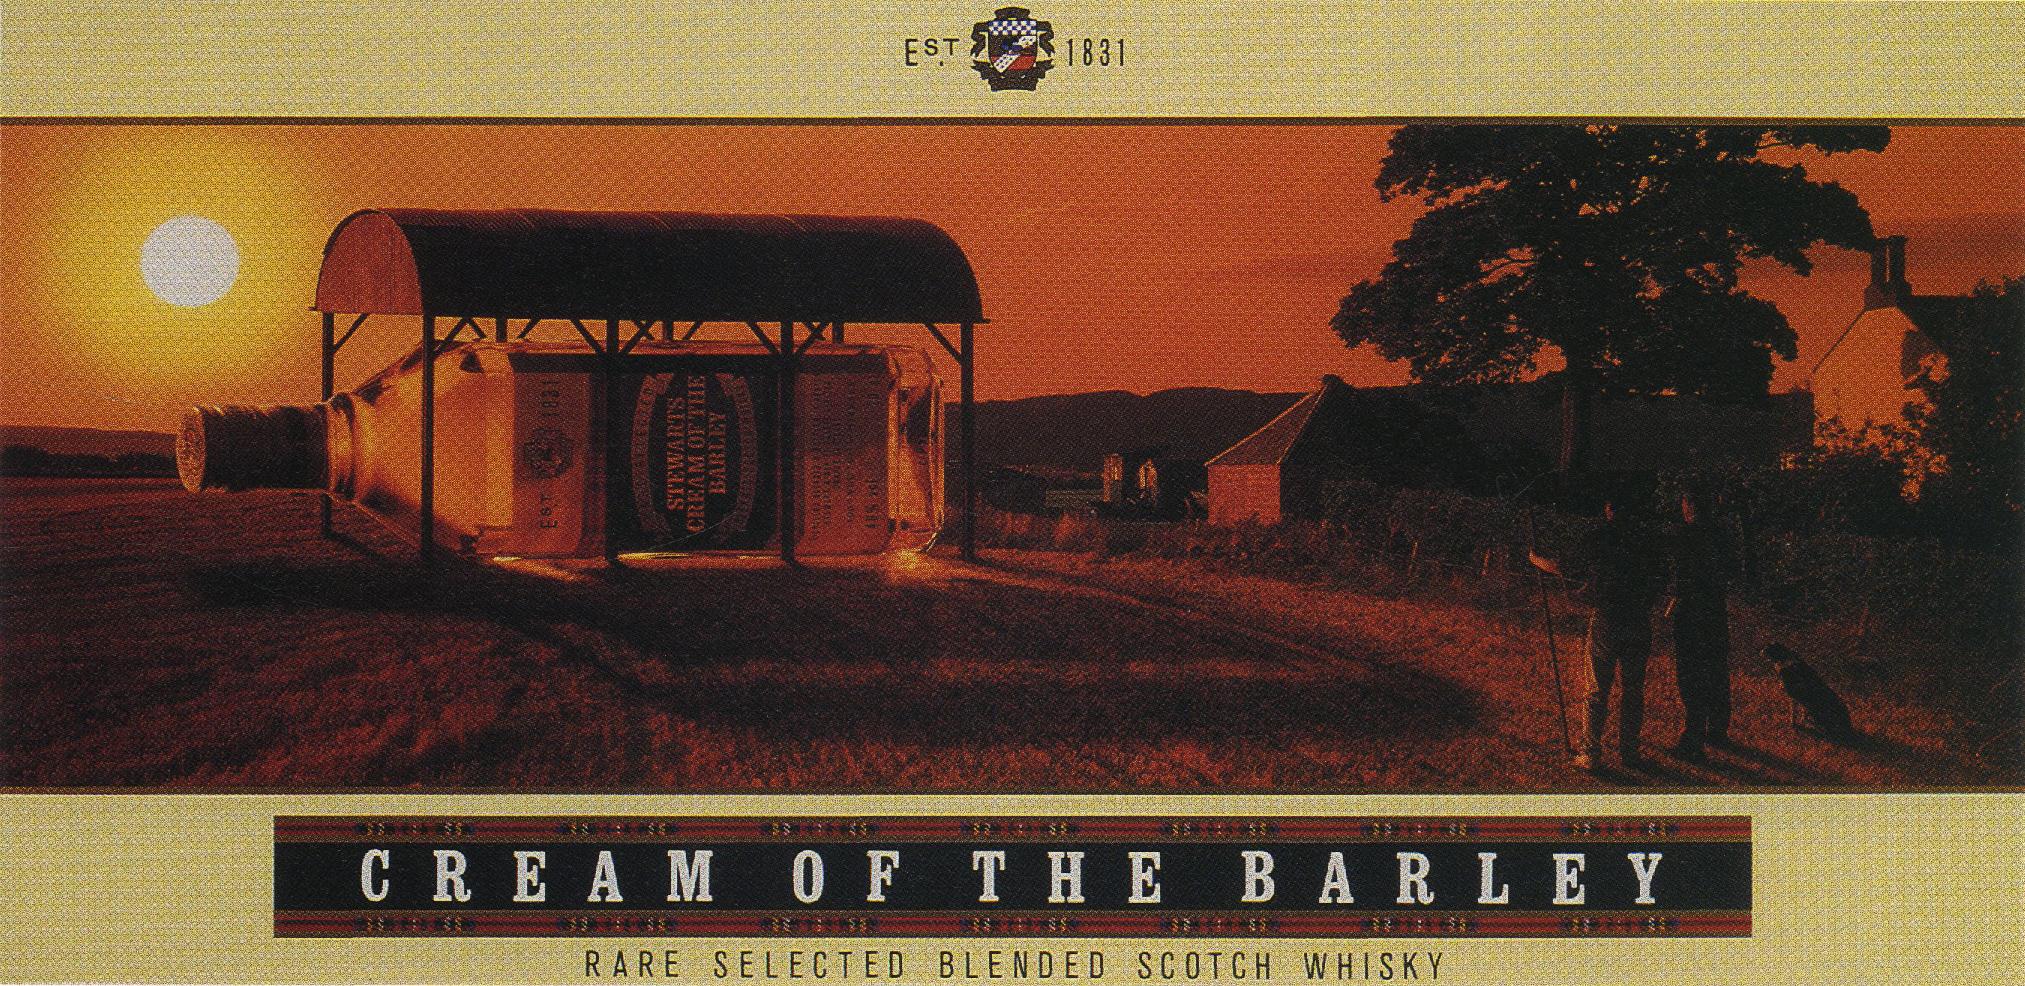 Cream of the Barley-Marr Ass-04